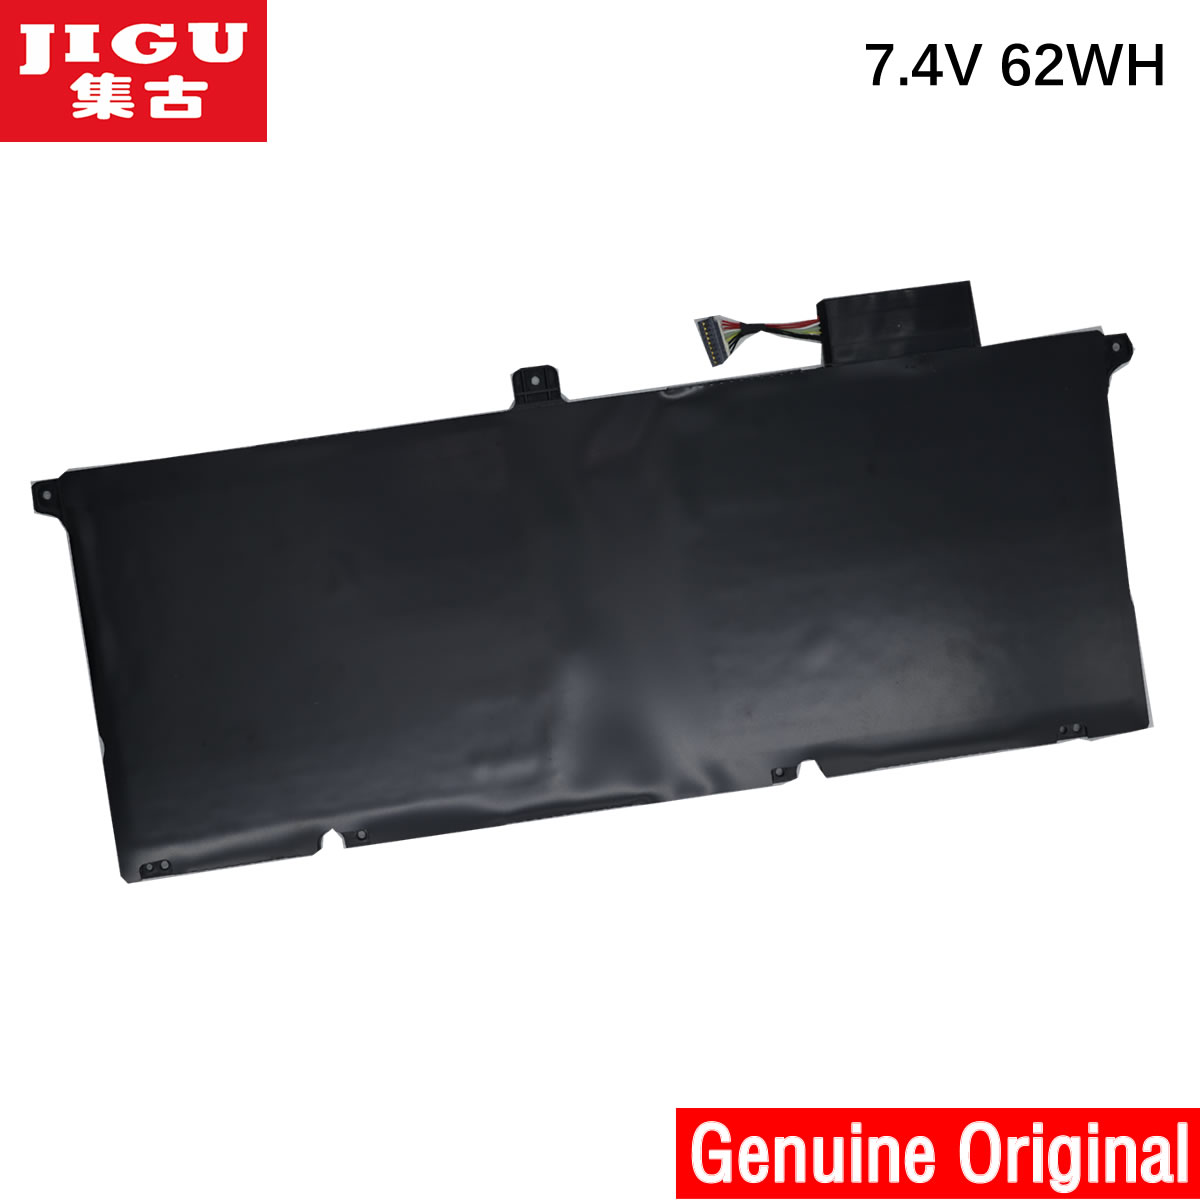 JIGU AA-PBXN8AR Replacement Laptop Battery For Samsung 900X4 900X46 900X4B-A01DE 900X4B-A01FR 900X4B-A03 900X4C-A01 NP900X4 hot sale replacement laptop battery for samsung 7800mah 11 1v 3530ea aa pb9nc6b aa pb9nc6w r580 r428